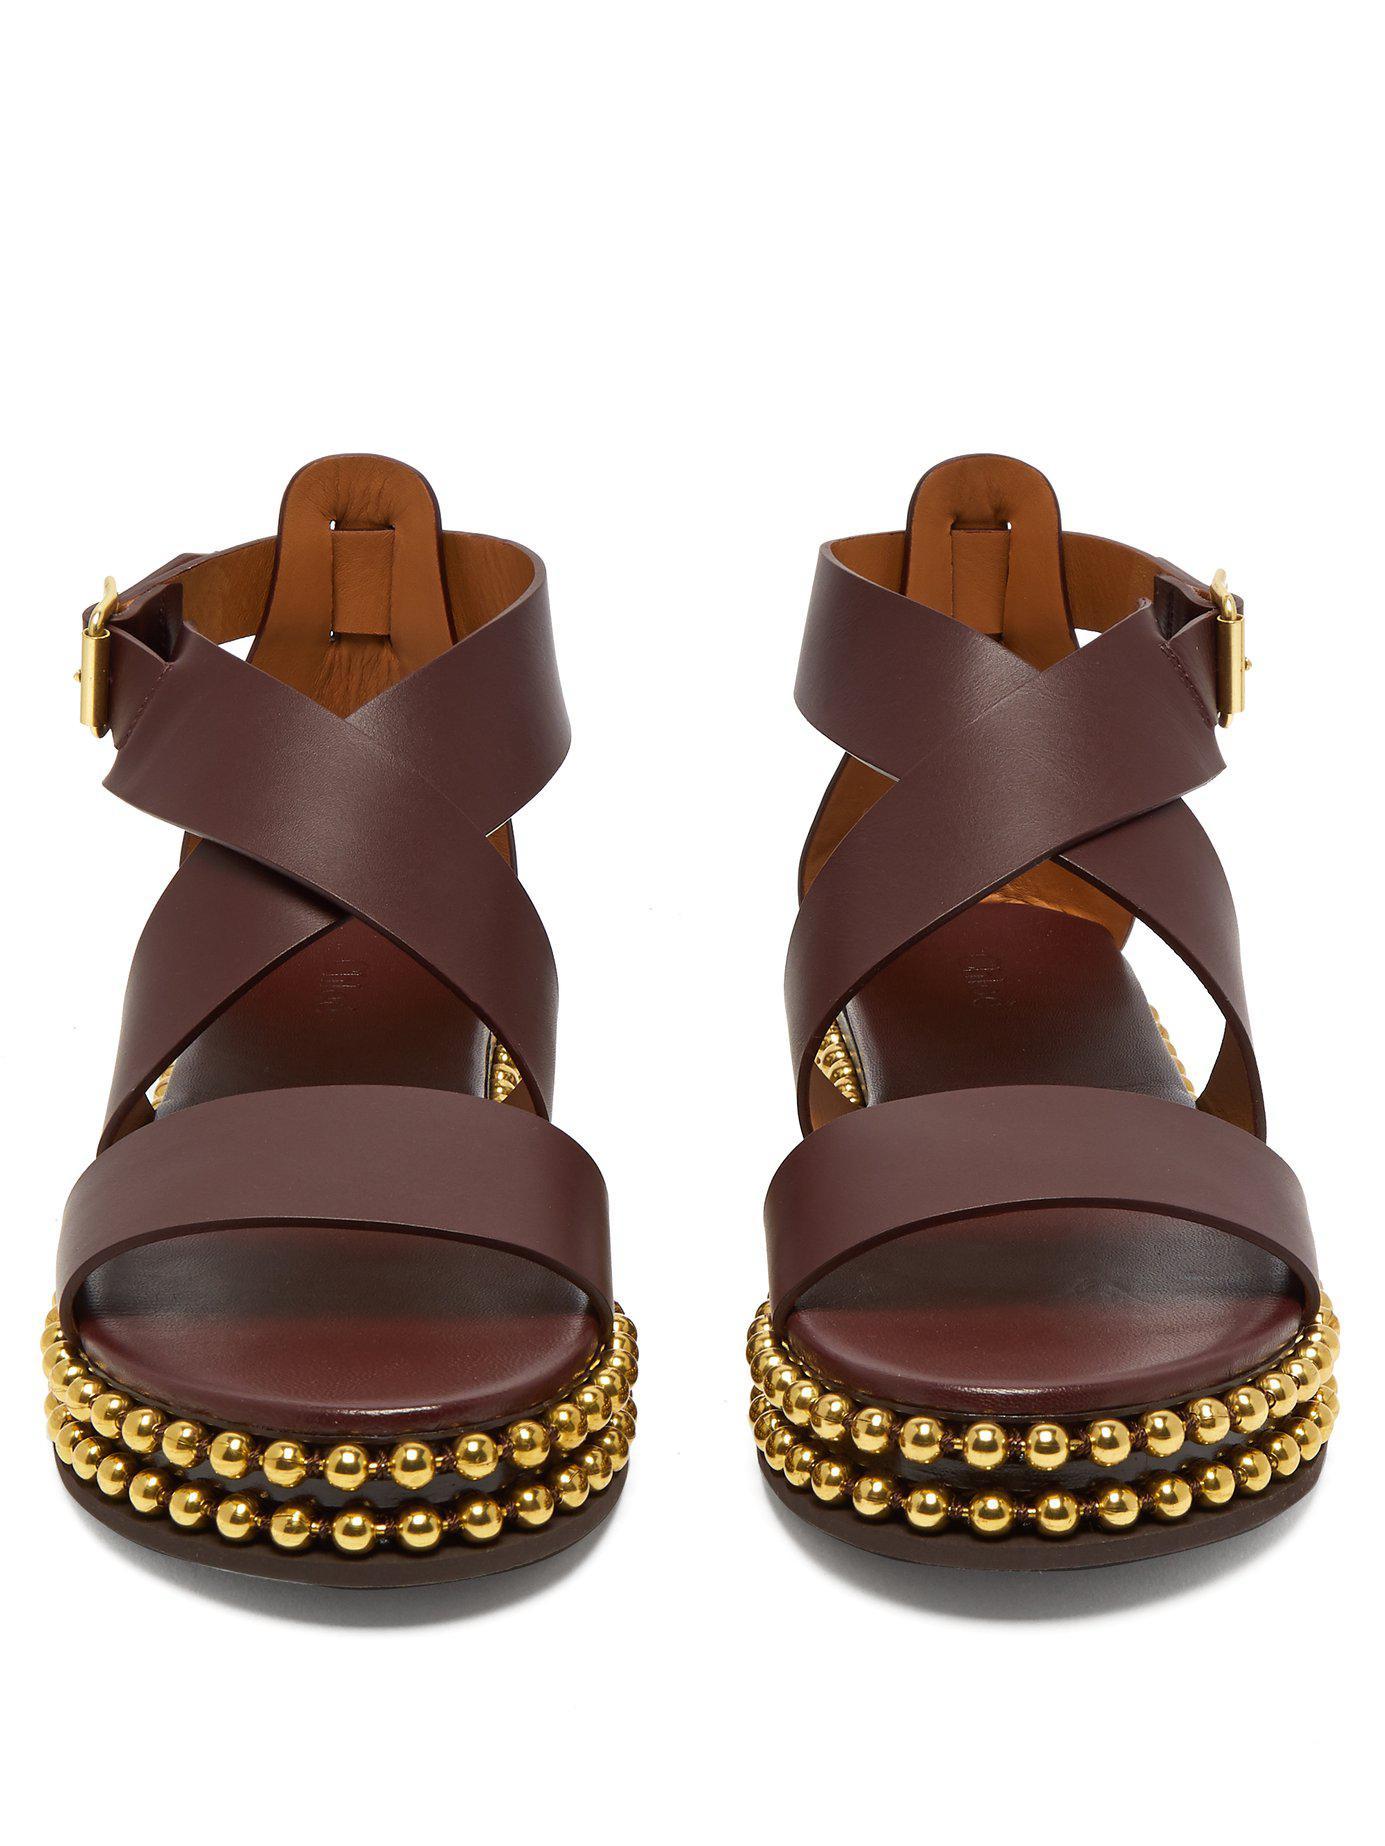 best website b263f 66382 chloe-burgundy-Beaded-Flatform-Leather-Sandals.jpeg